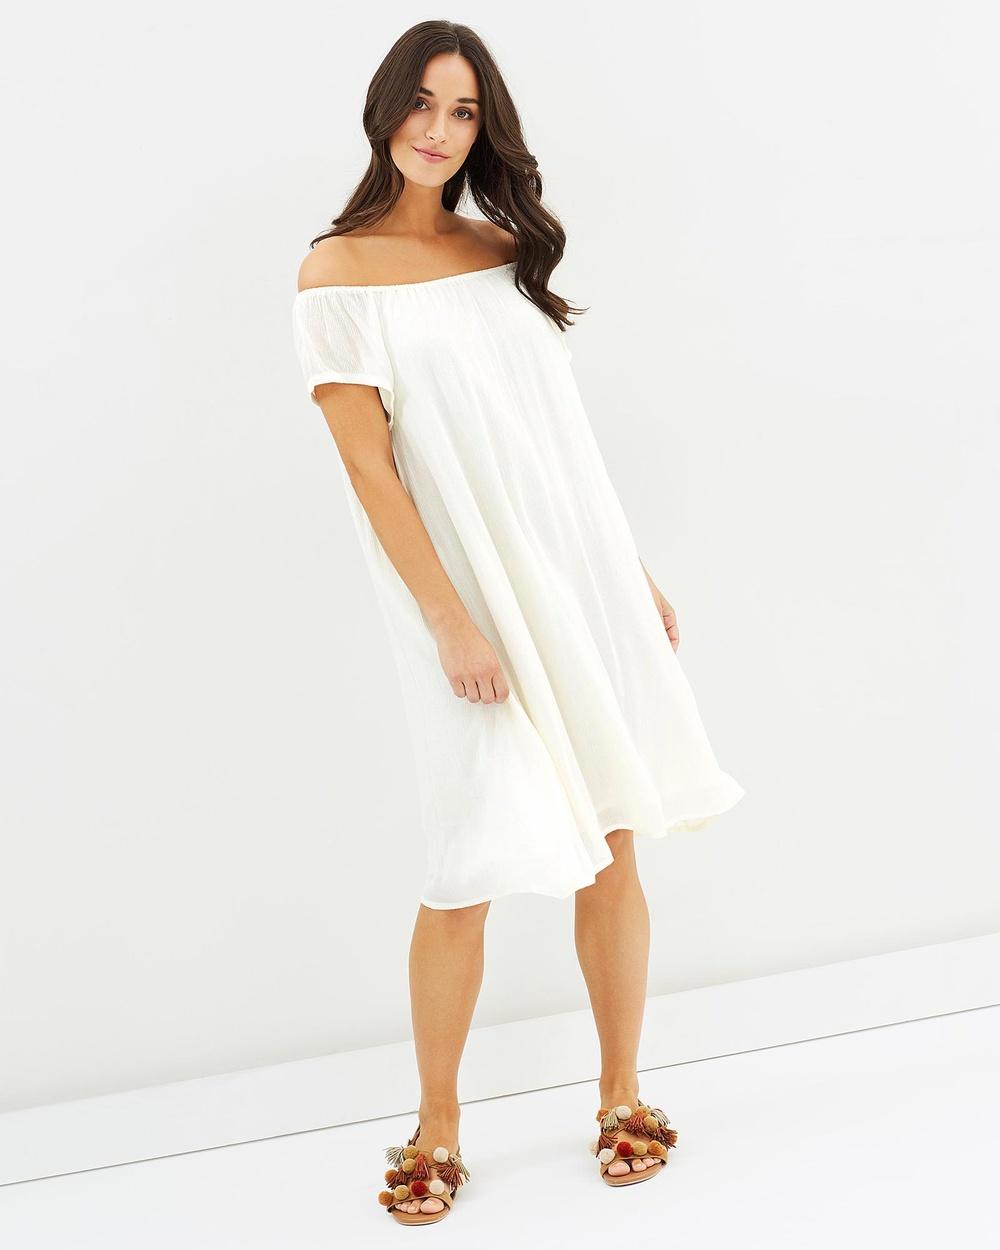 Kaja Clothing Ashey Dress Dresses White Ashey Dress